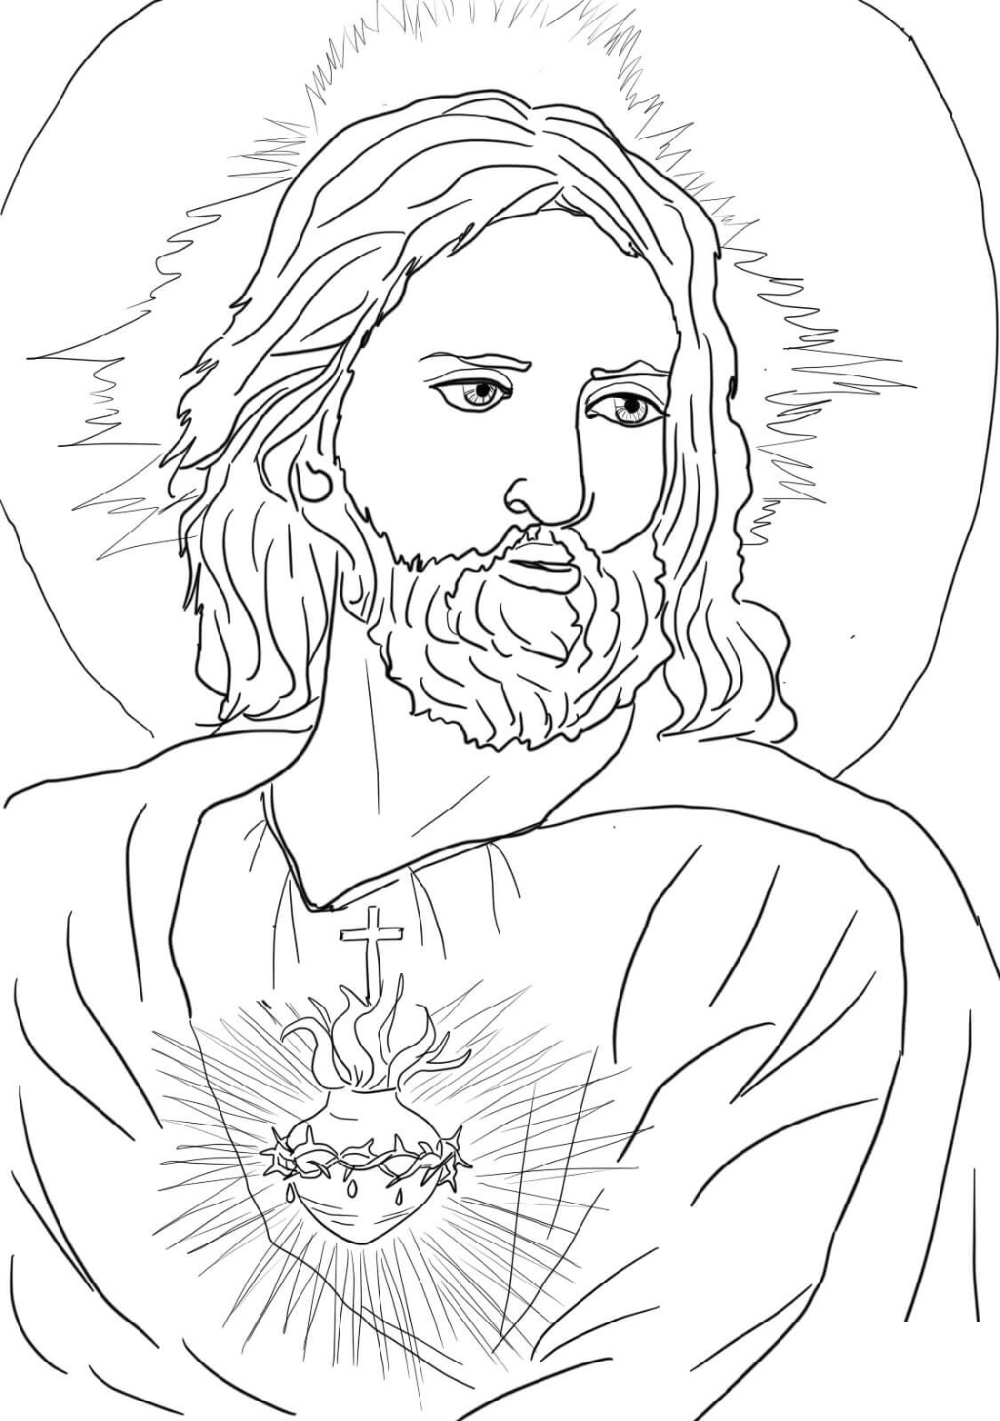 Jesus Coloring Pages Printable Jesus Coloring Pages Jesus Pictures Heart Coloring Pages